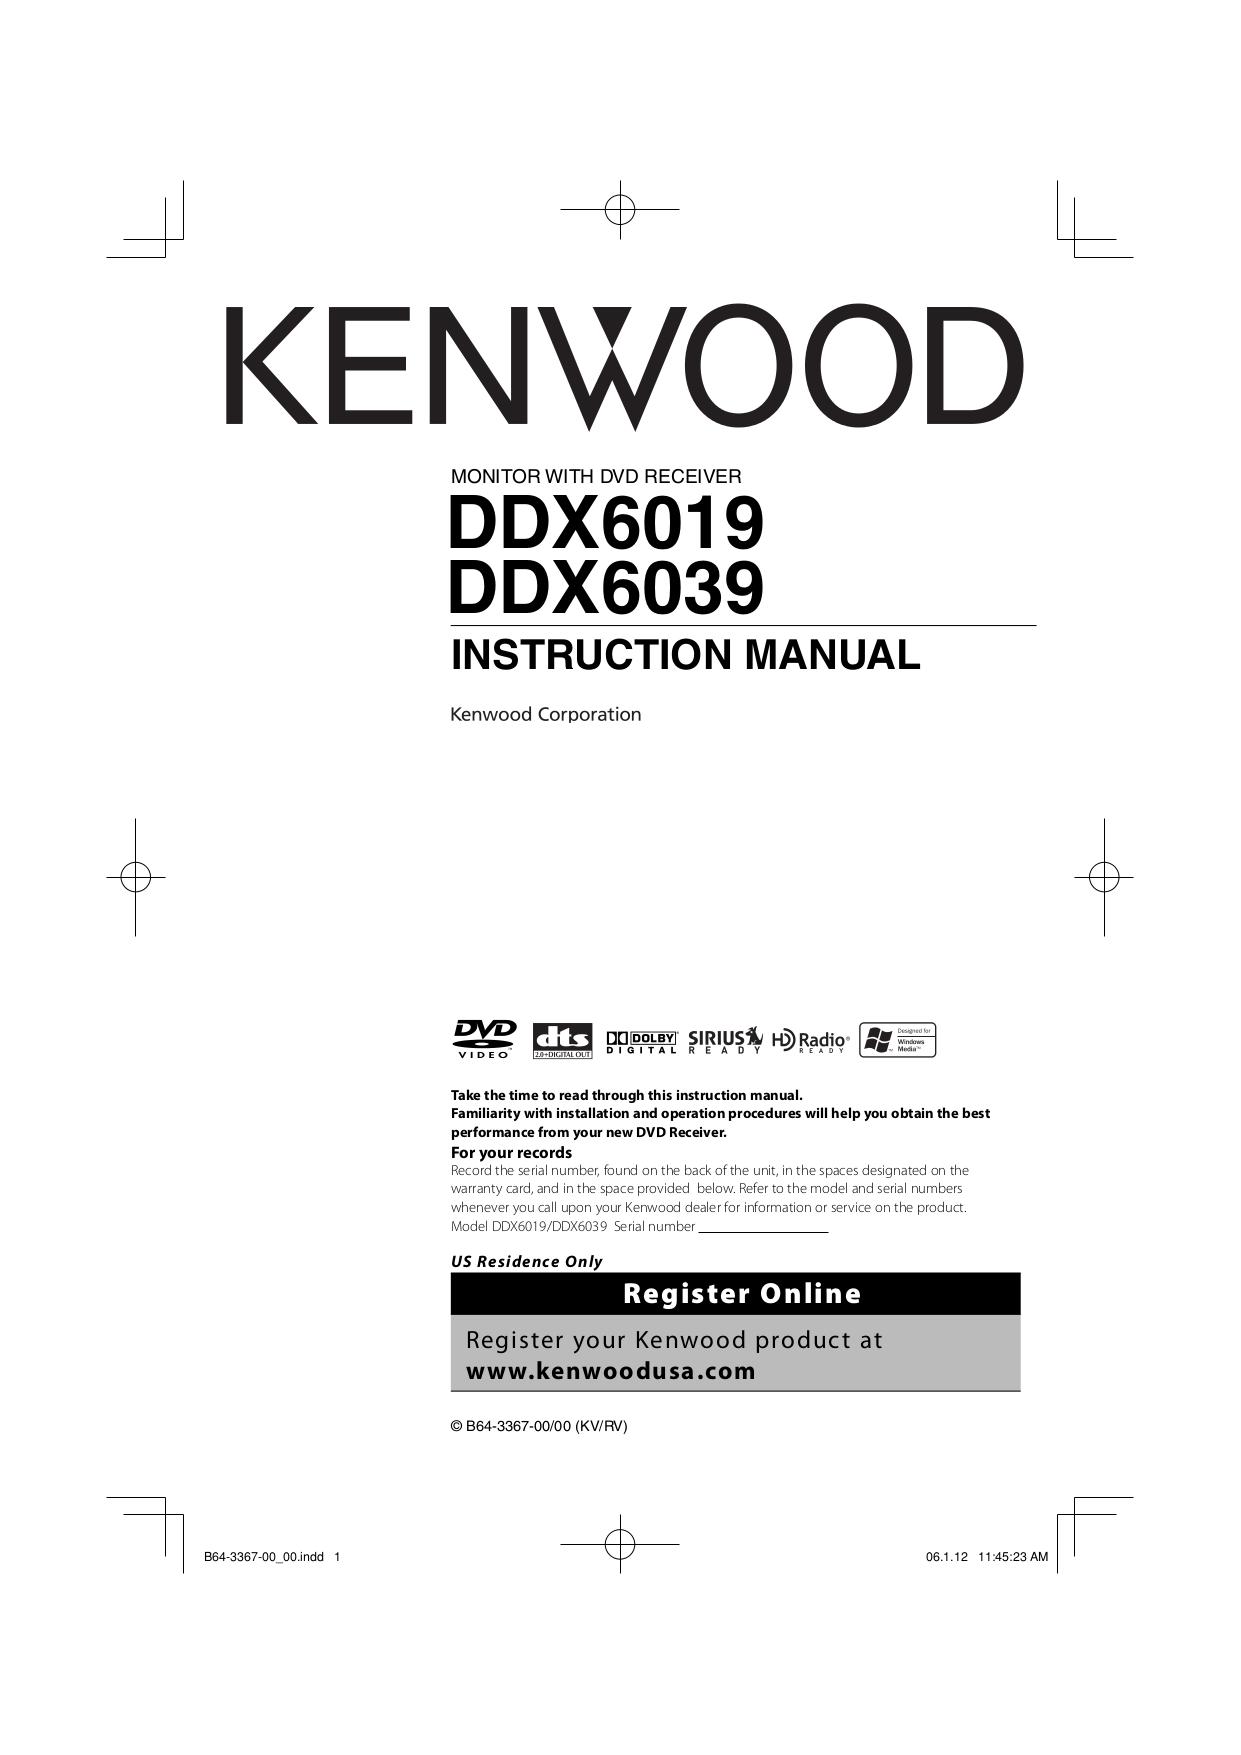 EBOOK-9424] Kenwood Kdc 2025 Instruction Manual | 2019 Ebook Liry on kenwood model kdc-352u, kenwood wiring external speaker, kenwood radios,